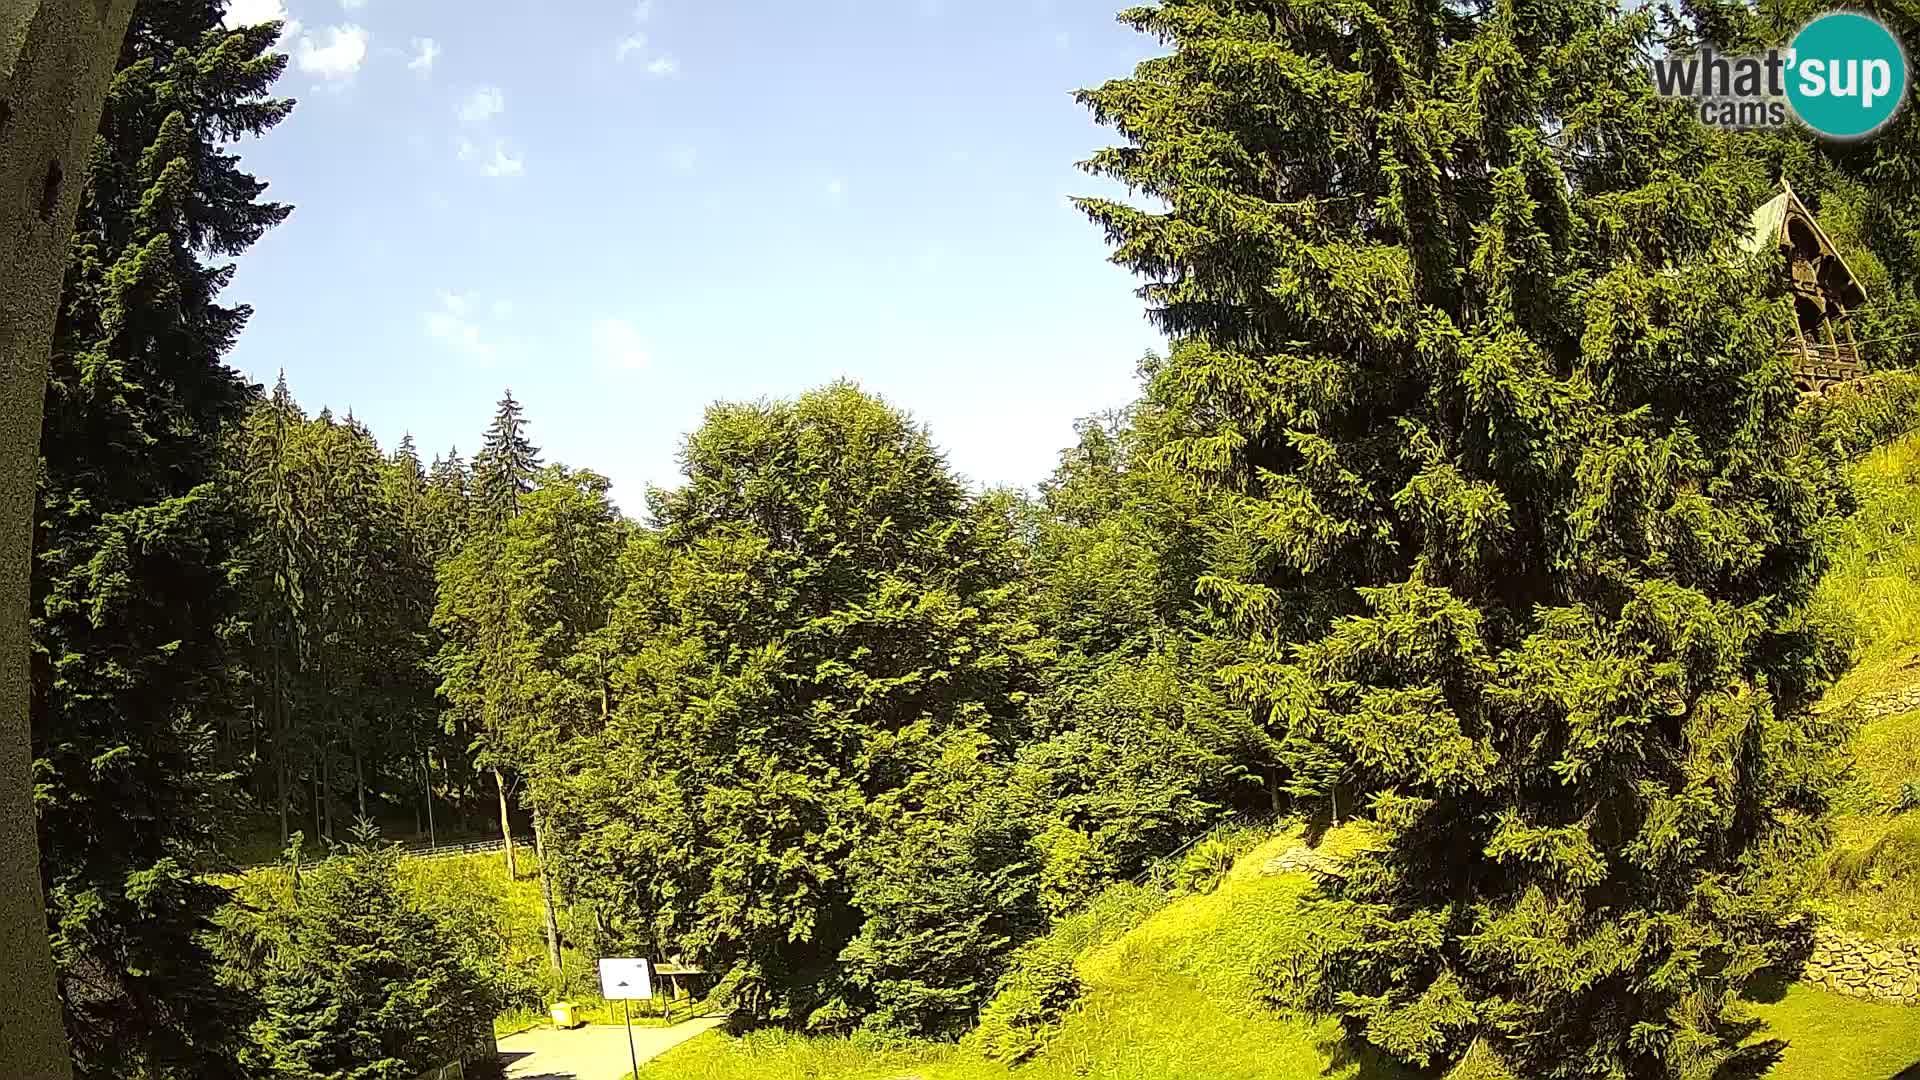 LIVE Webcam Spalona – Cross Country Ski Resort livecam Bystrzyckie Mountains